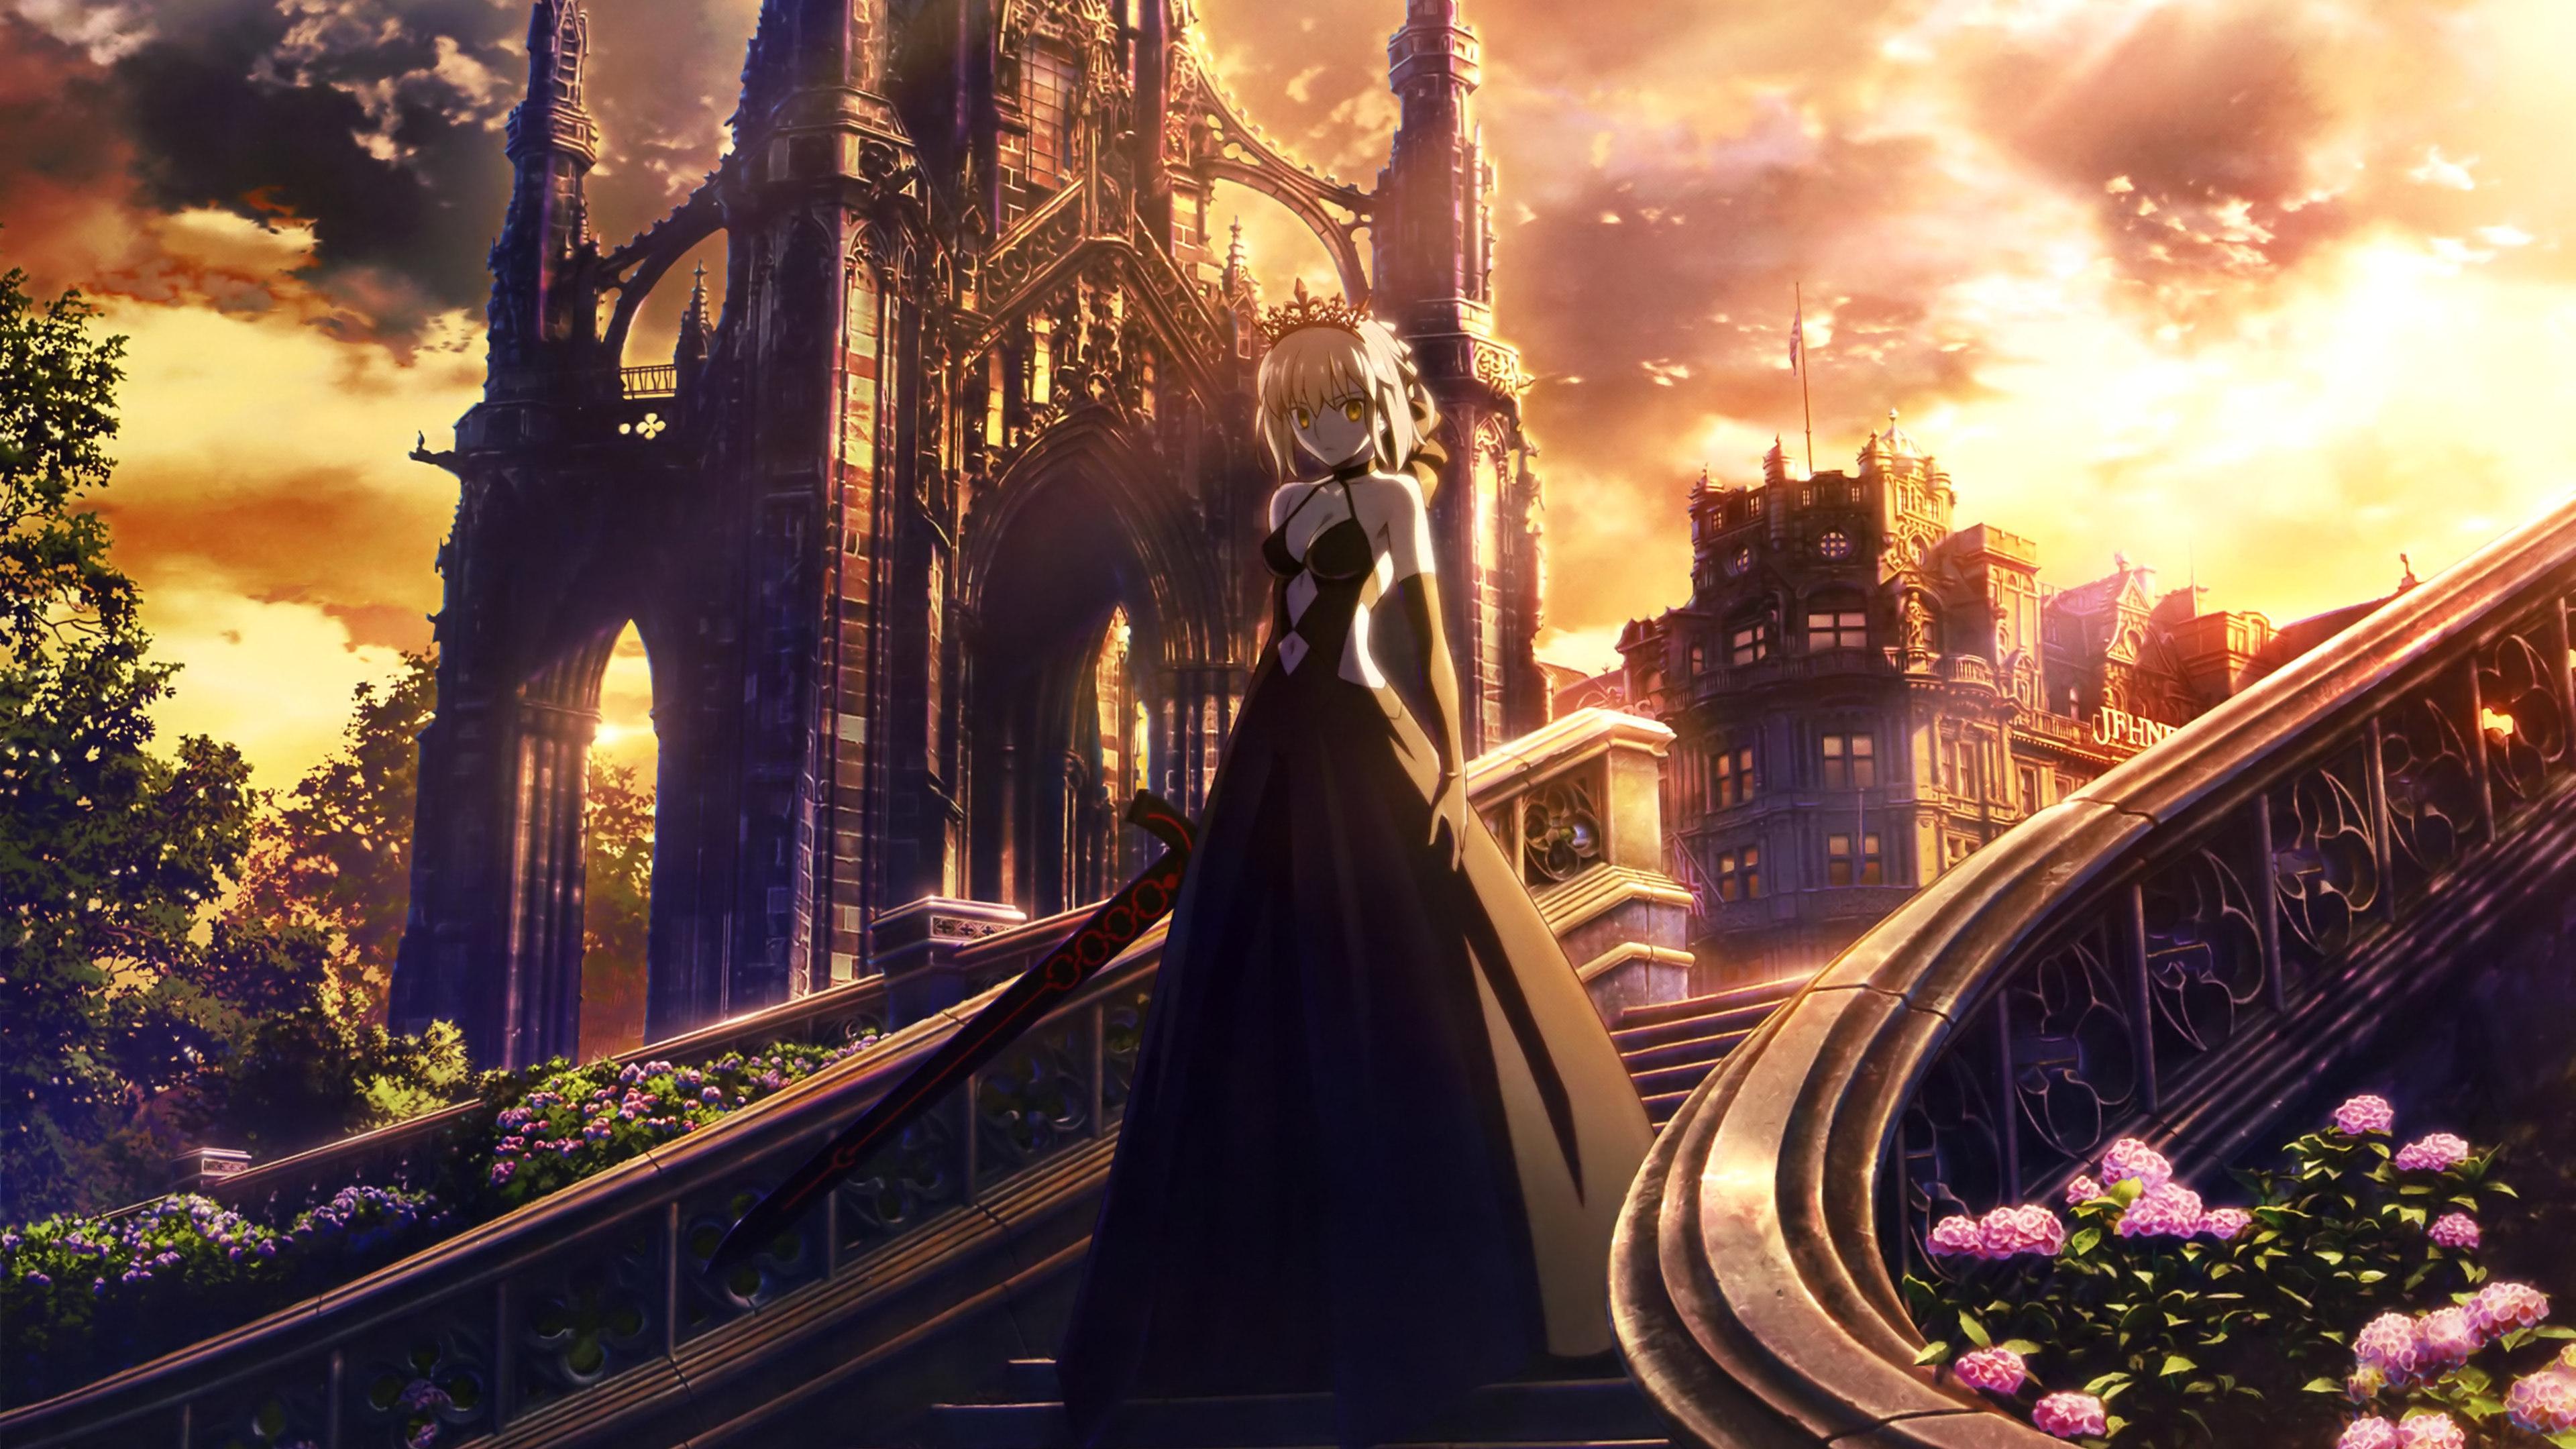 Fate Stay Night Anime Girl Walking Through Stairs Anime Girl Wallpaper 4k 3137798 Hd Wallpaper Backgrounds Download